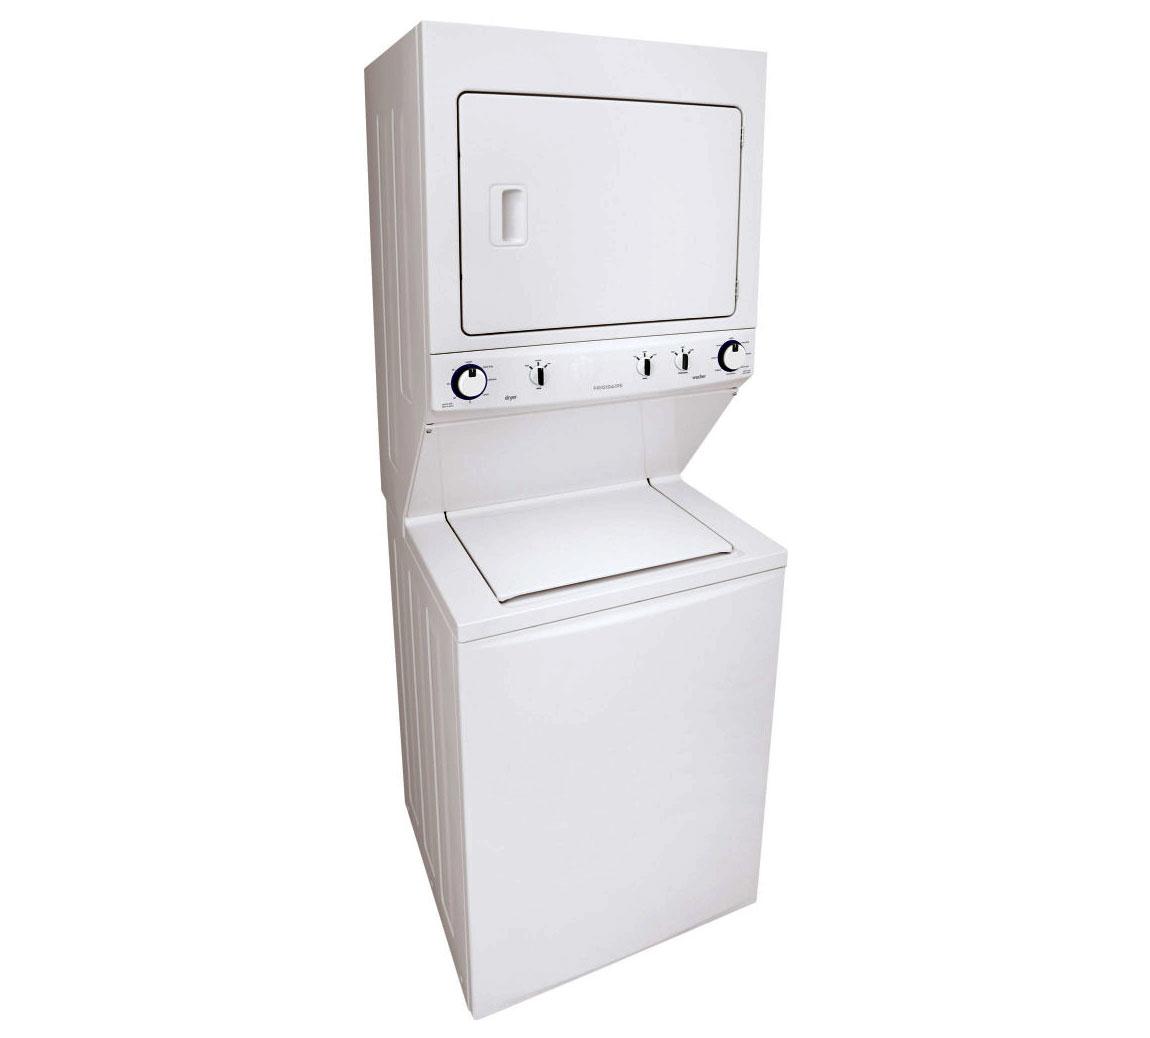 Frigidaire 27 Quot Gas Washer Dryer Combo Fflg3911qw Lp Gas